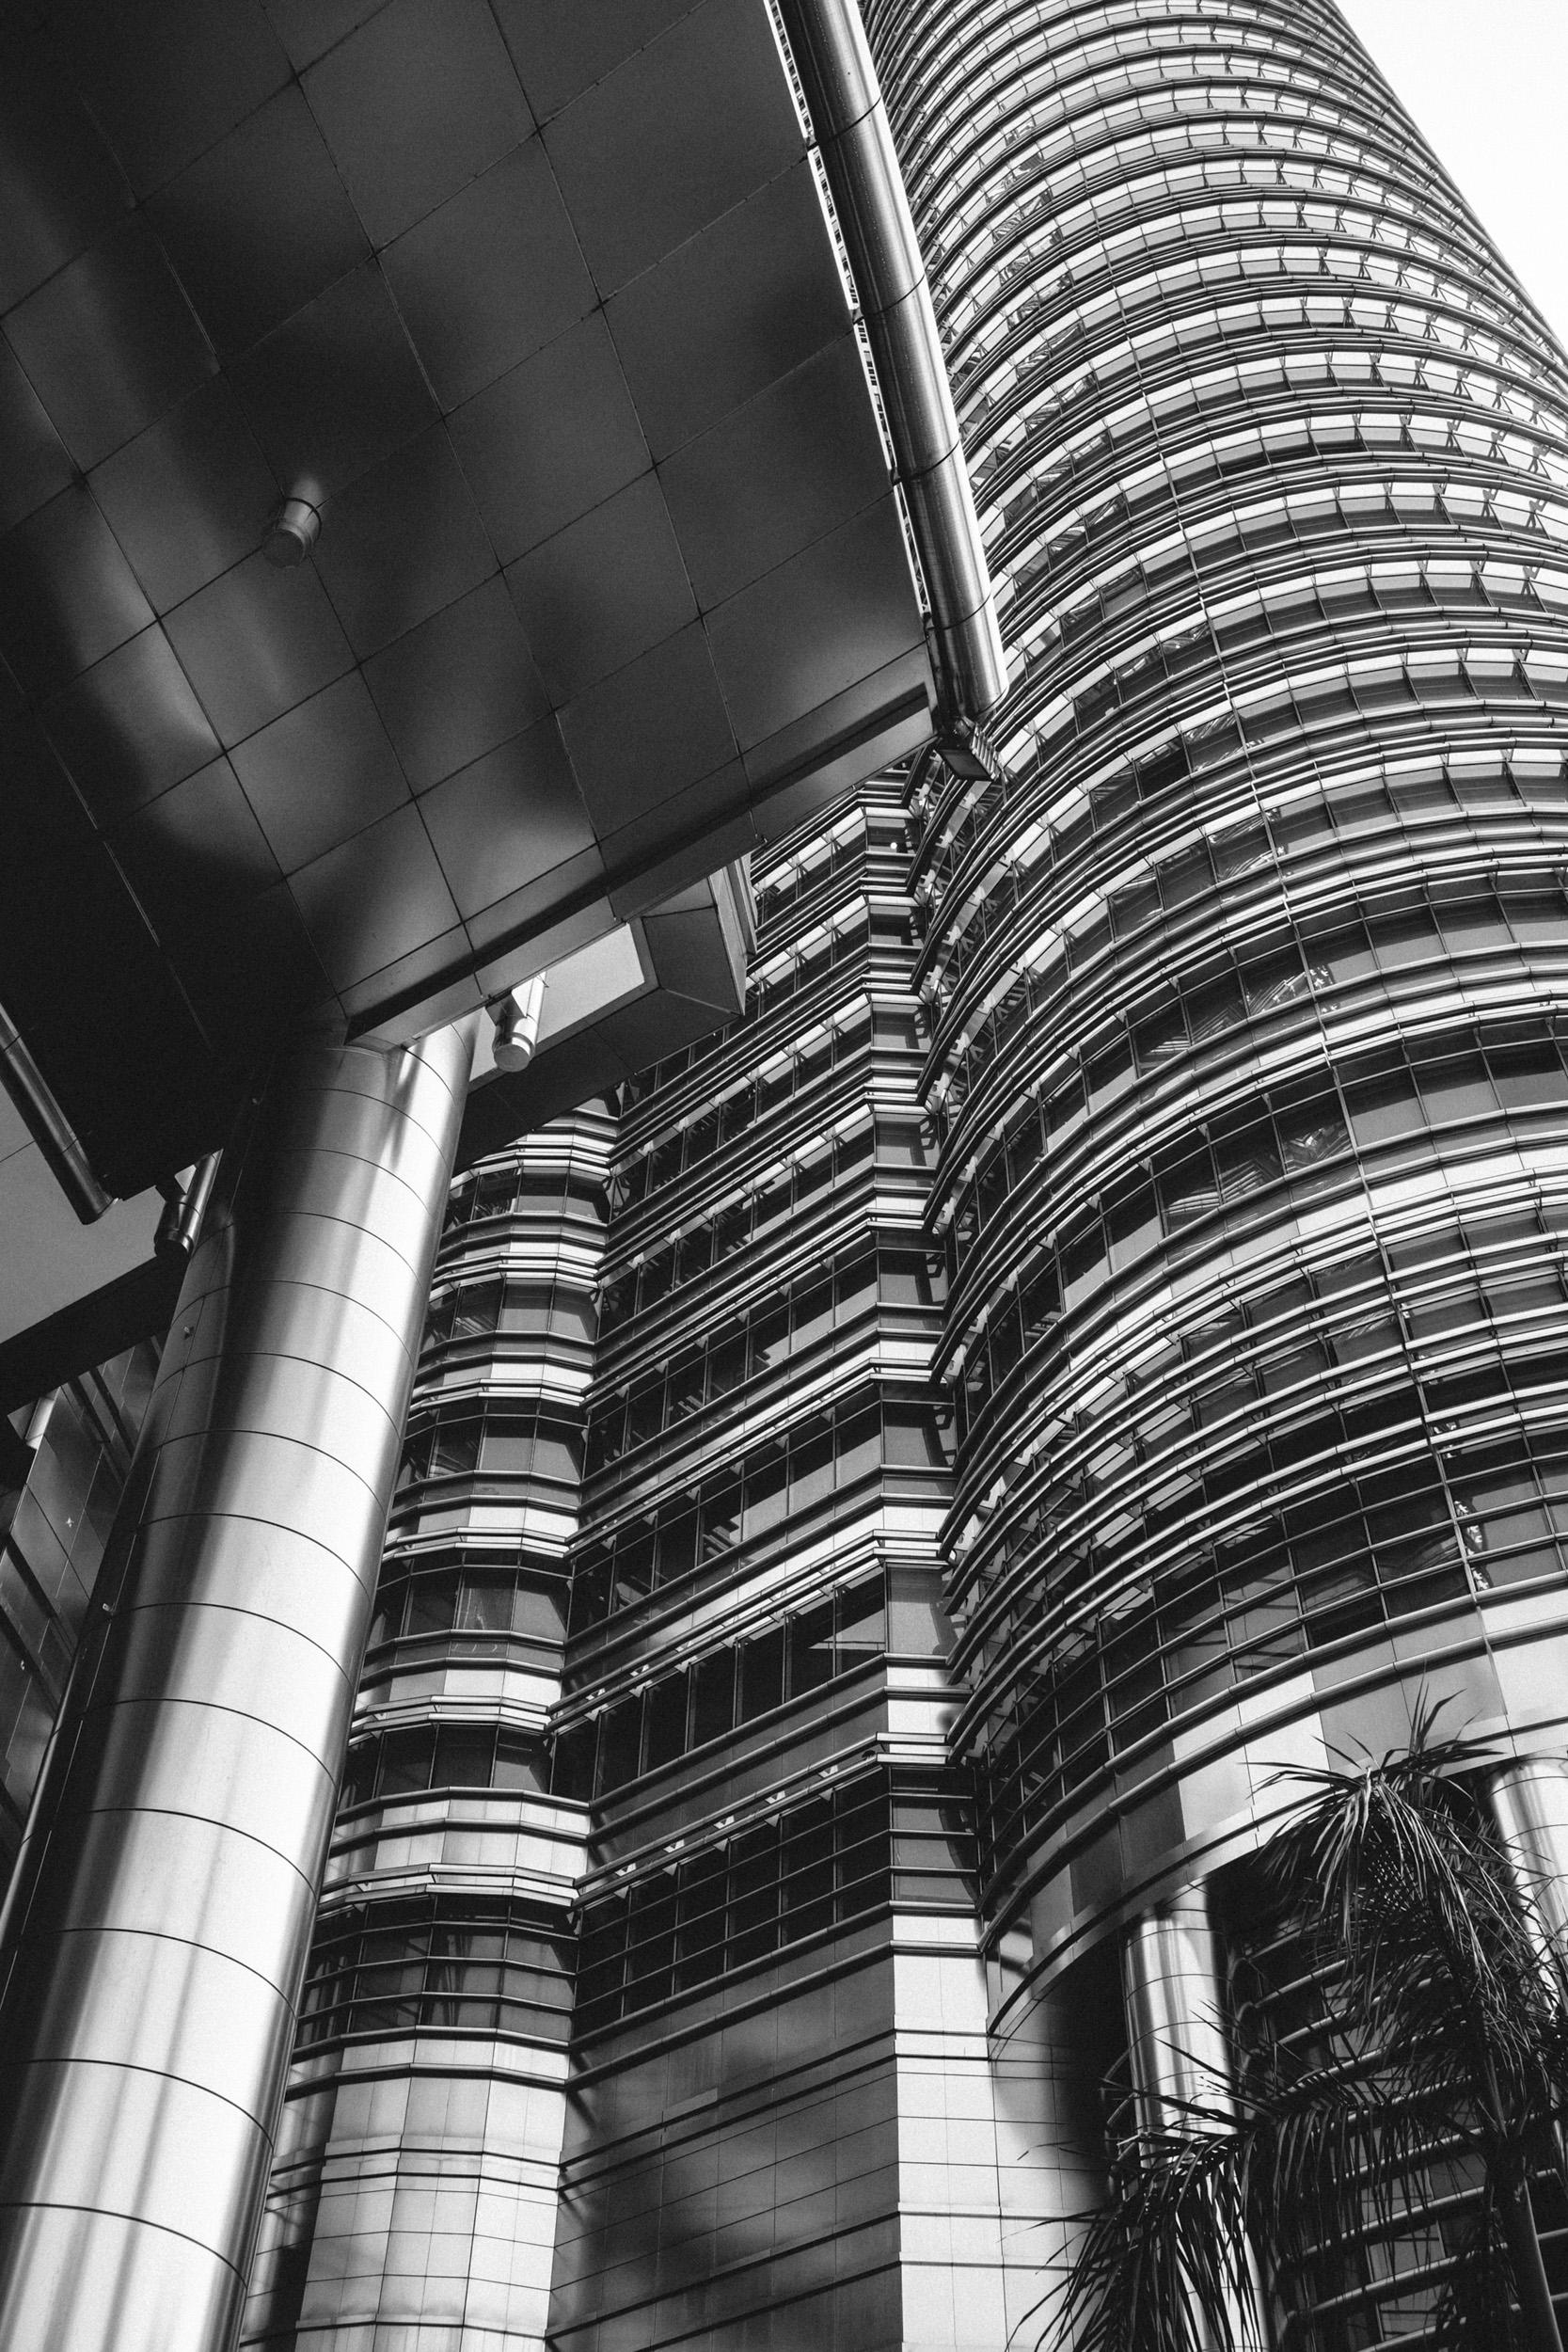 kuala_lumpur_architecture_photographer_02.jpg